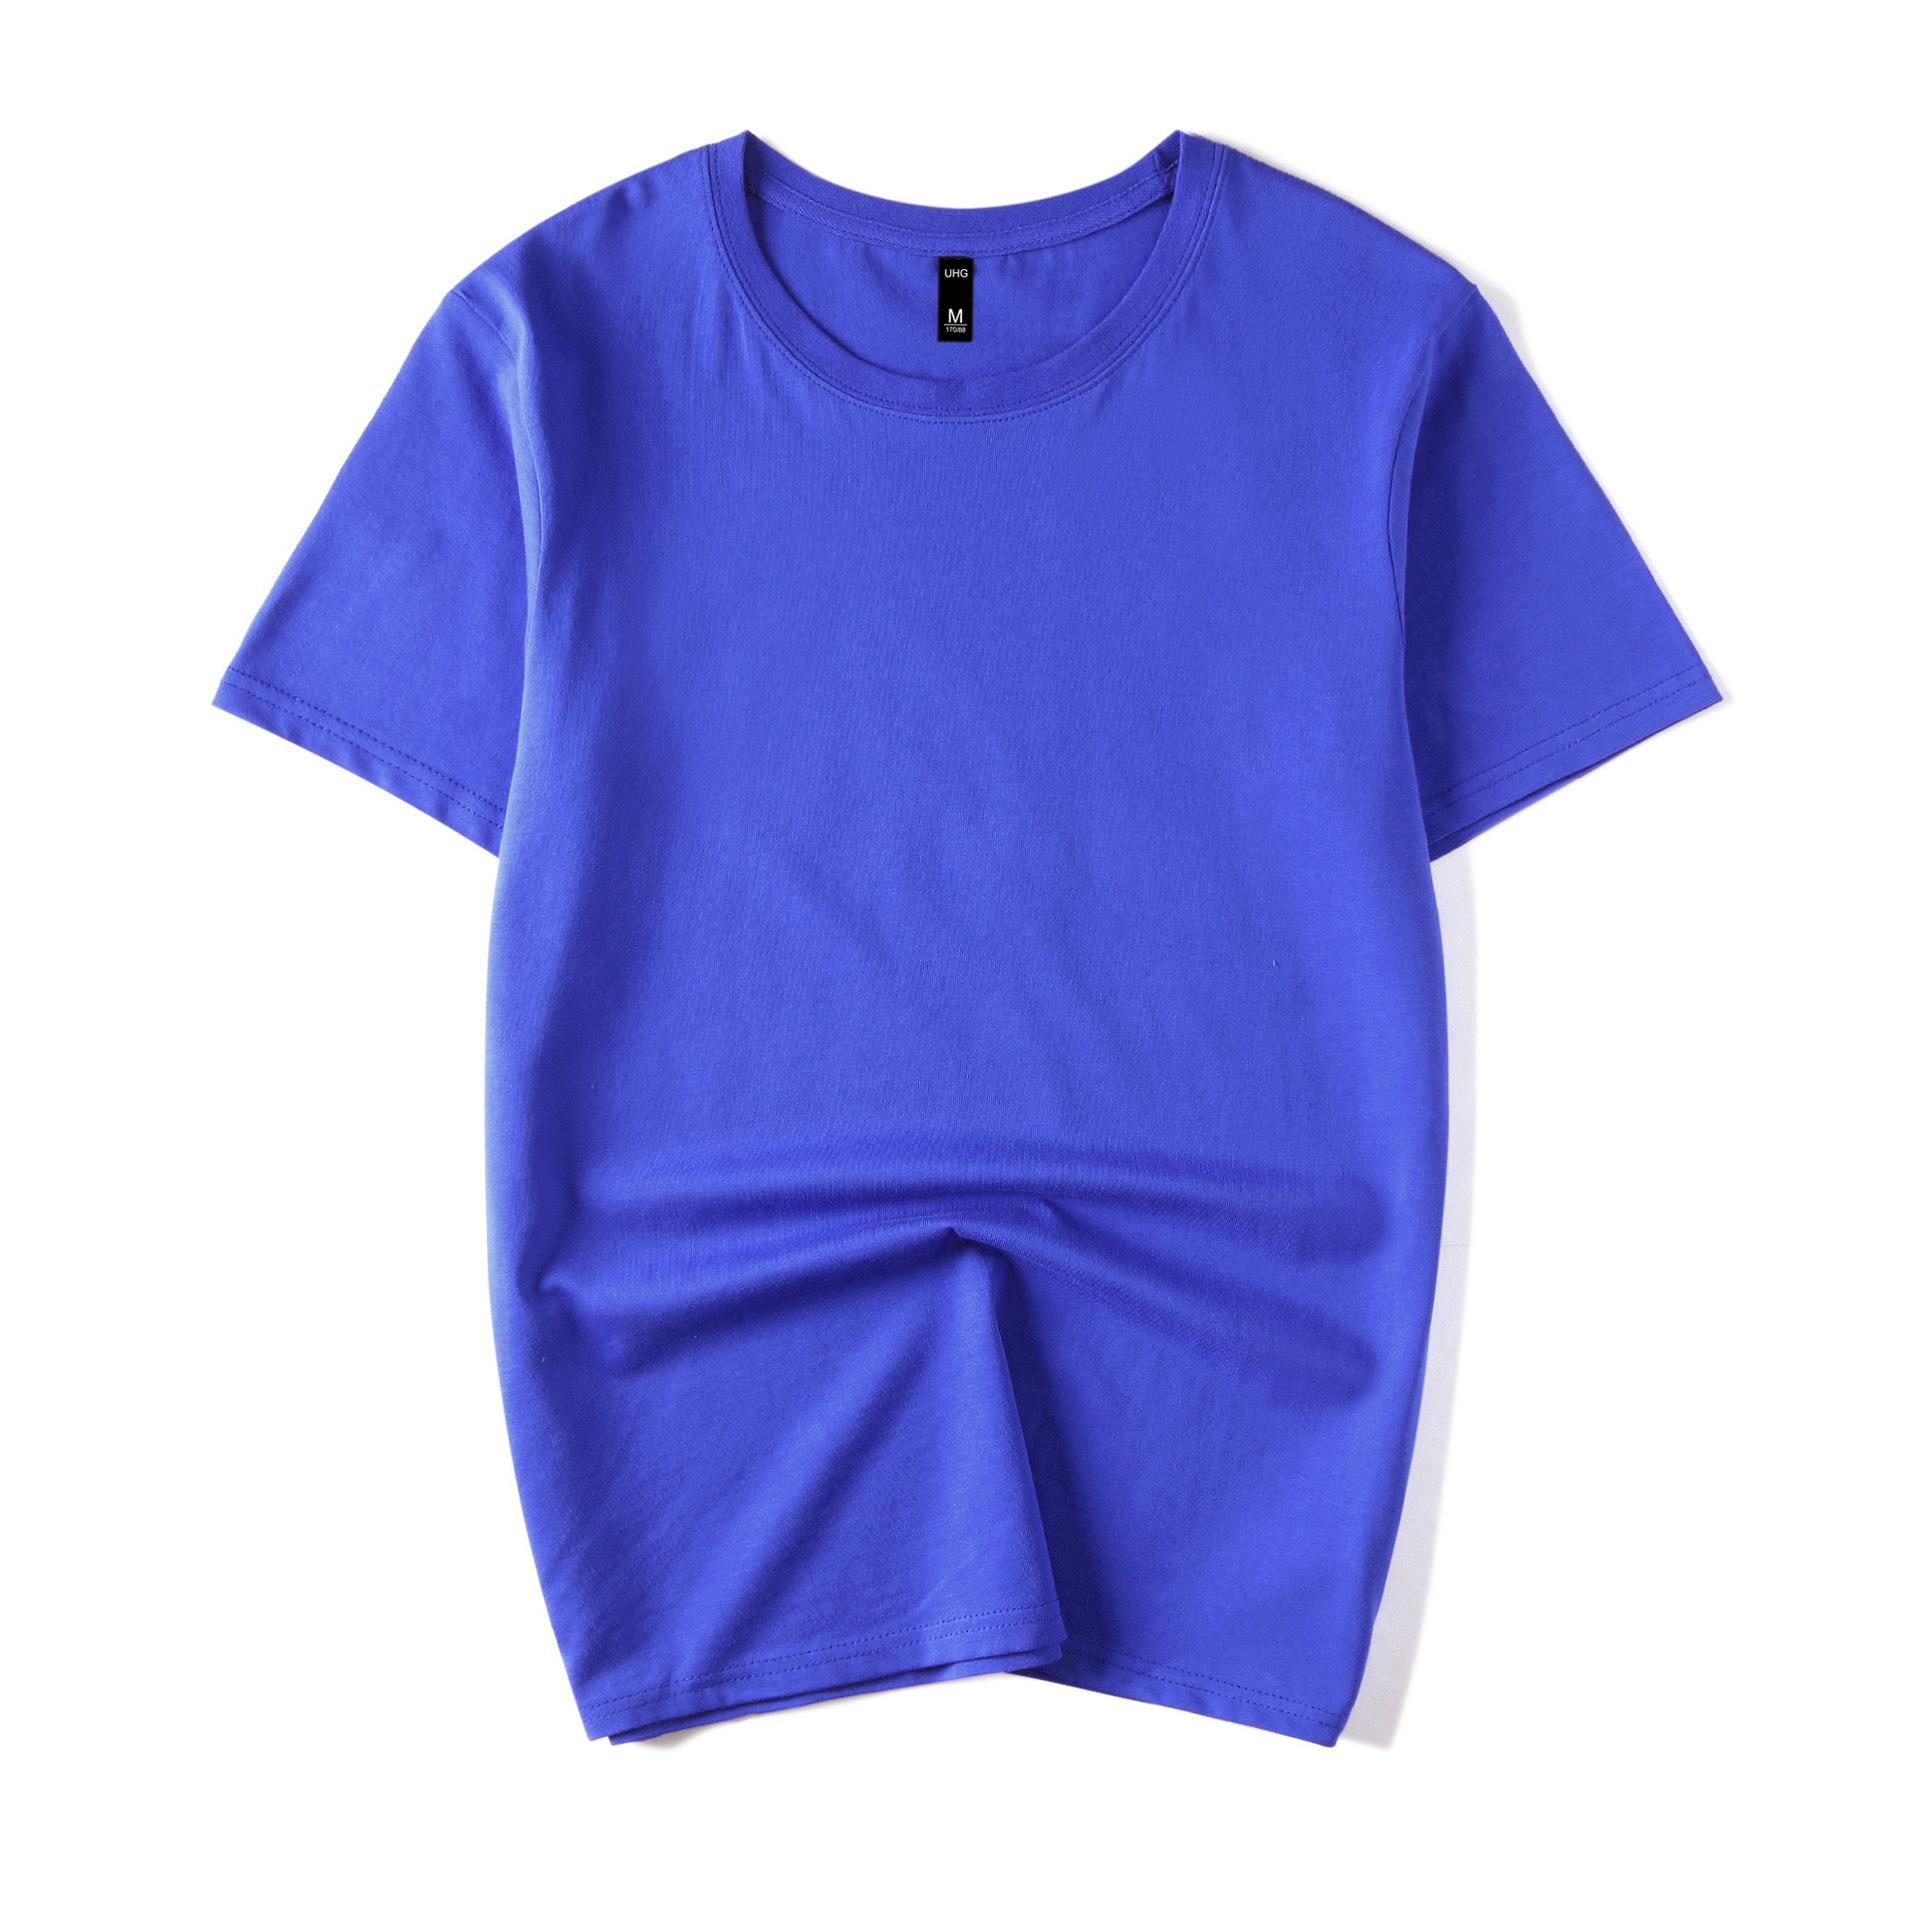 Royal blue Men's short sleeve T-shirt